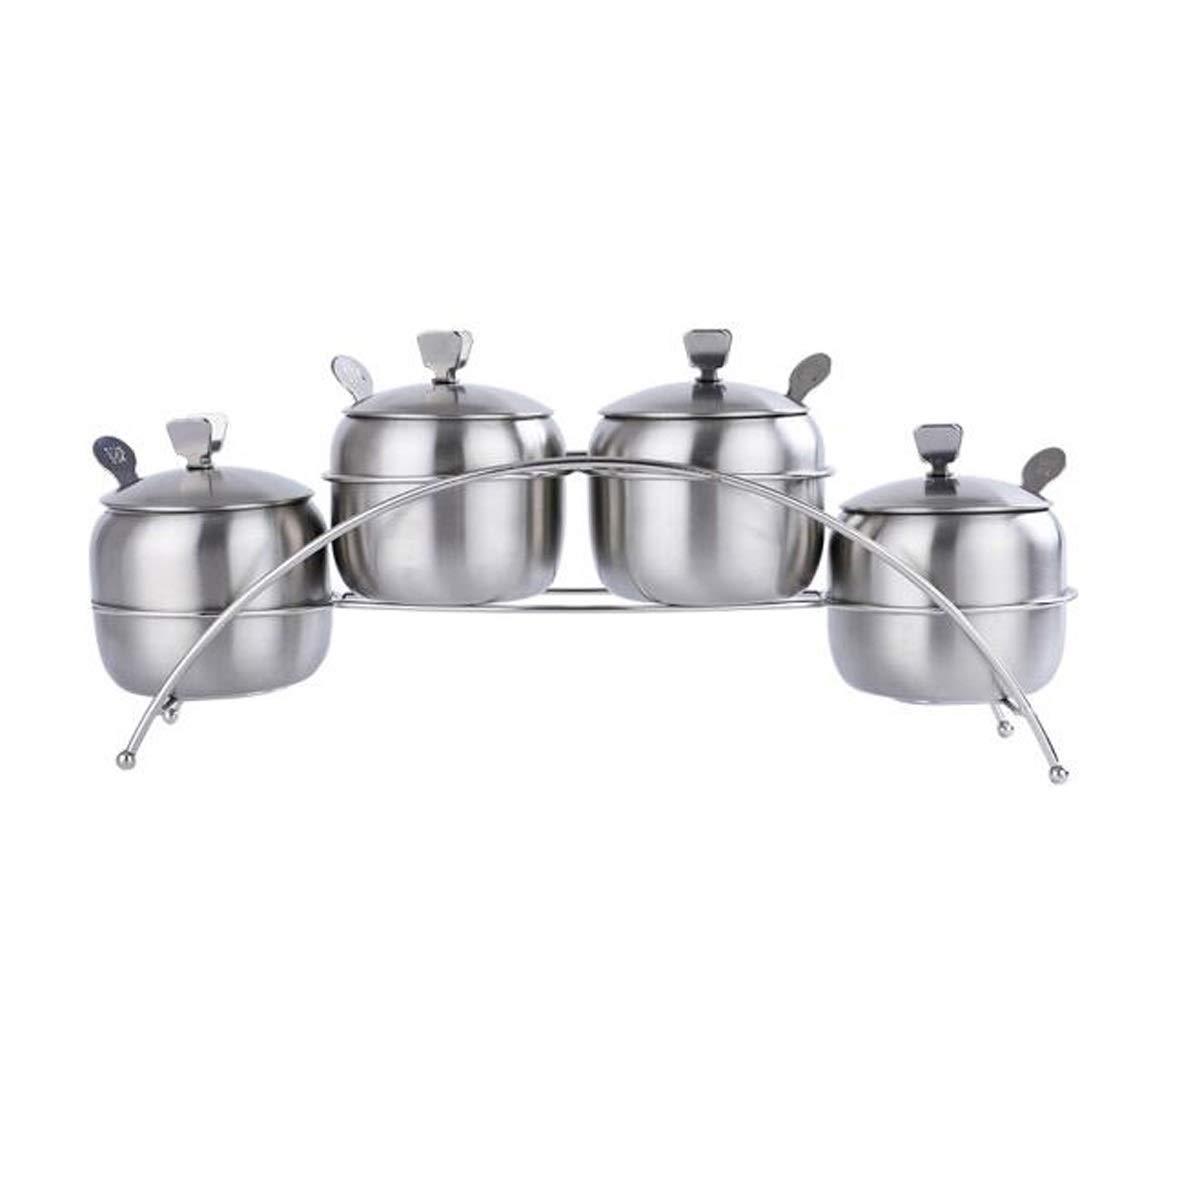 MINGRUIGONGMAO 304 stainless steel 4 grain seasoning jar Kitchen kitchen seasoning bottle Spice box Spice tank oil salt can (with spoon) Silver Plush toys (Color : Silver) by MINGRUIGONGMAO